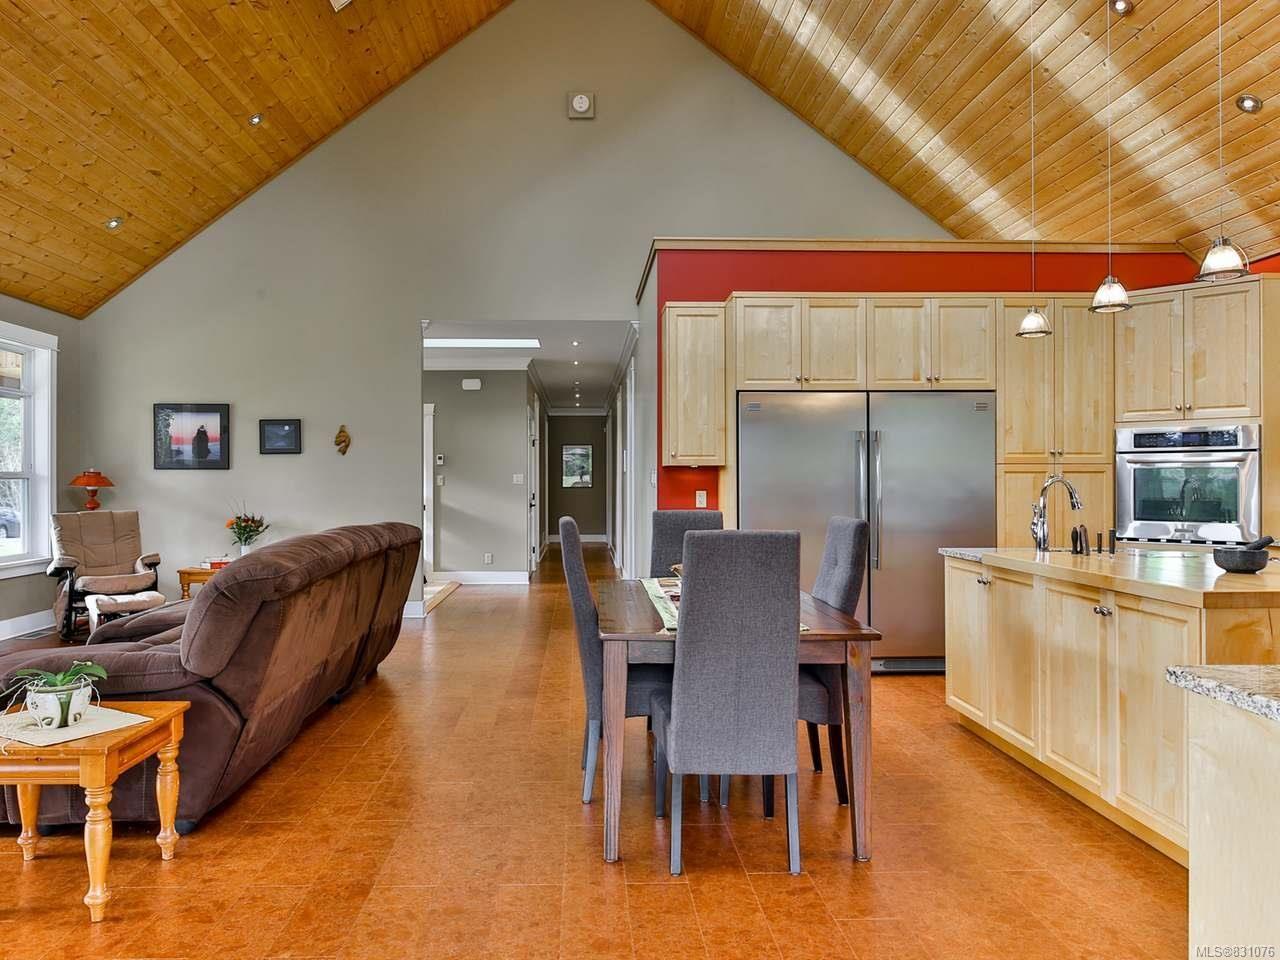 Photo 12: Photos: 6159 Strathcona St in PORT ALBERNI: PA Alberni Valley House for sale (Port Alberni)  : MLS®# 831076